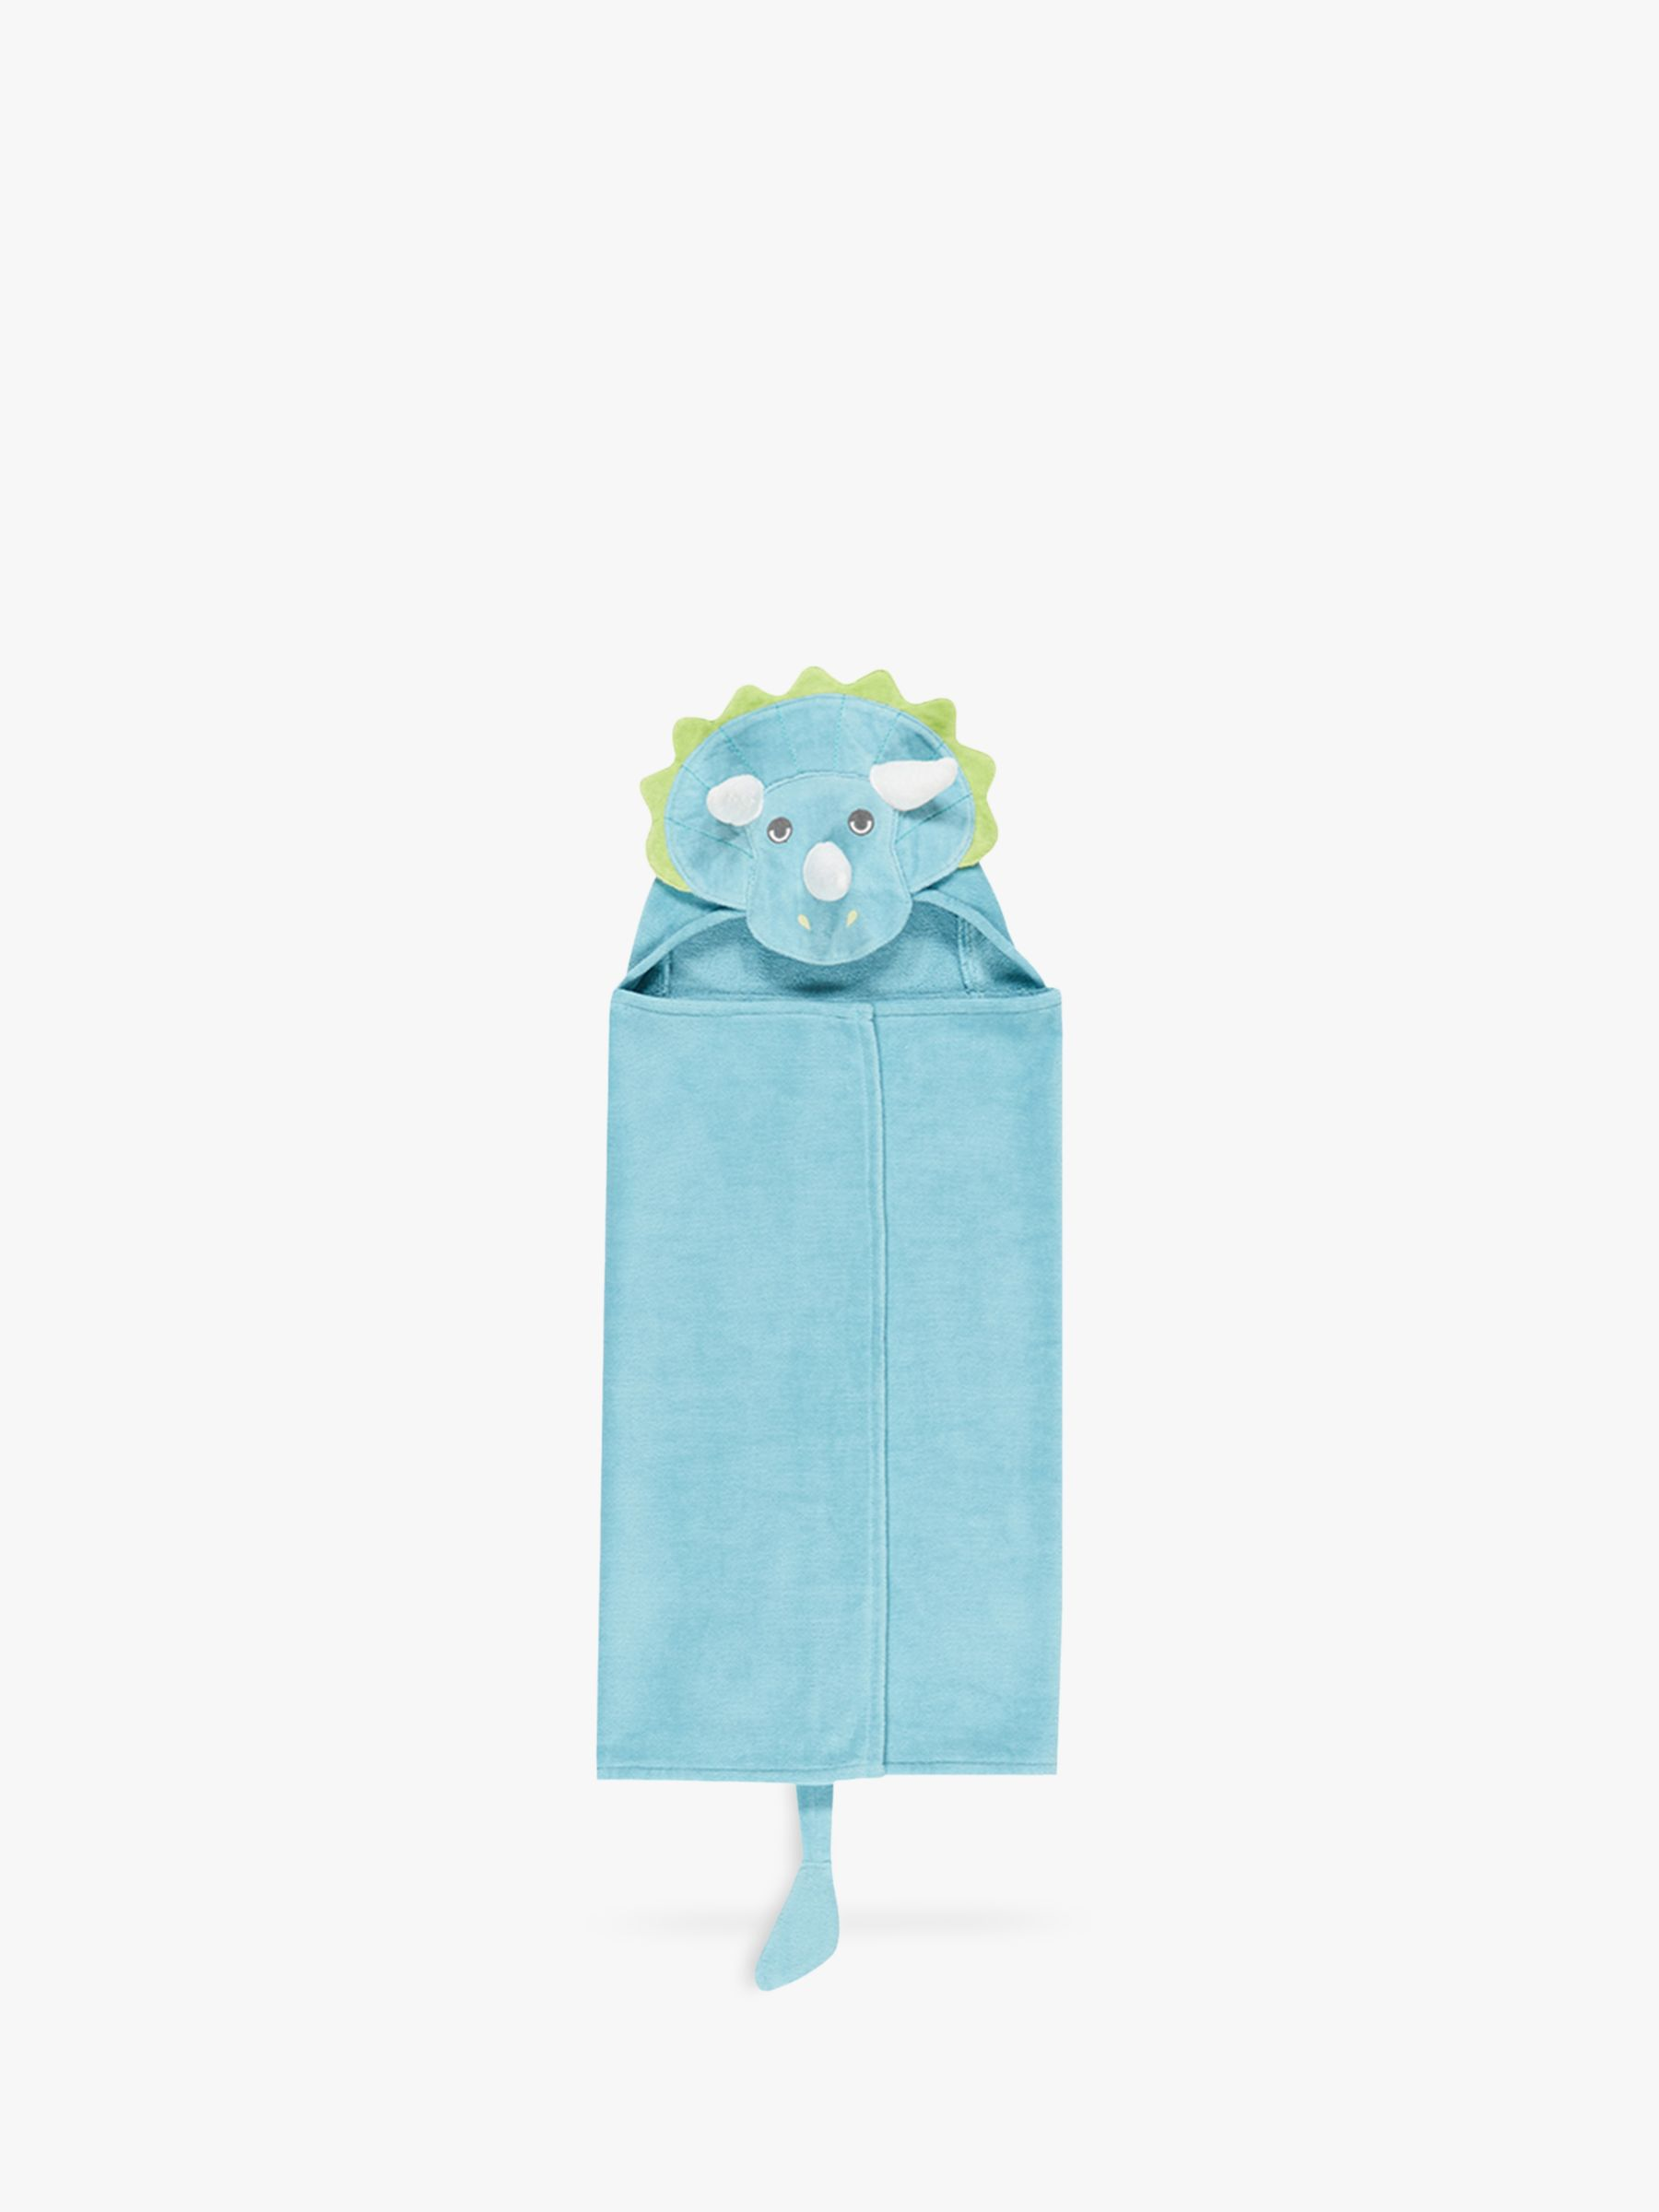 Pottery Barn Kids Dinosaur Critter Hooded Bath Towel, Blue